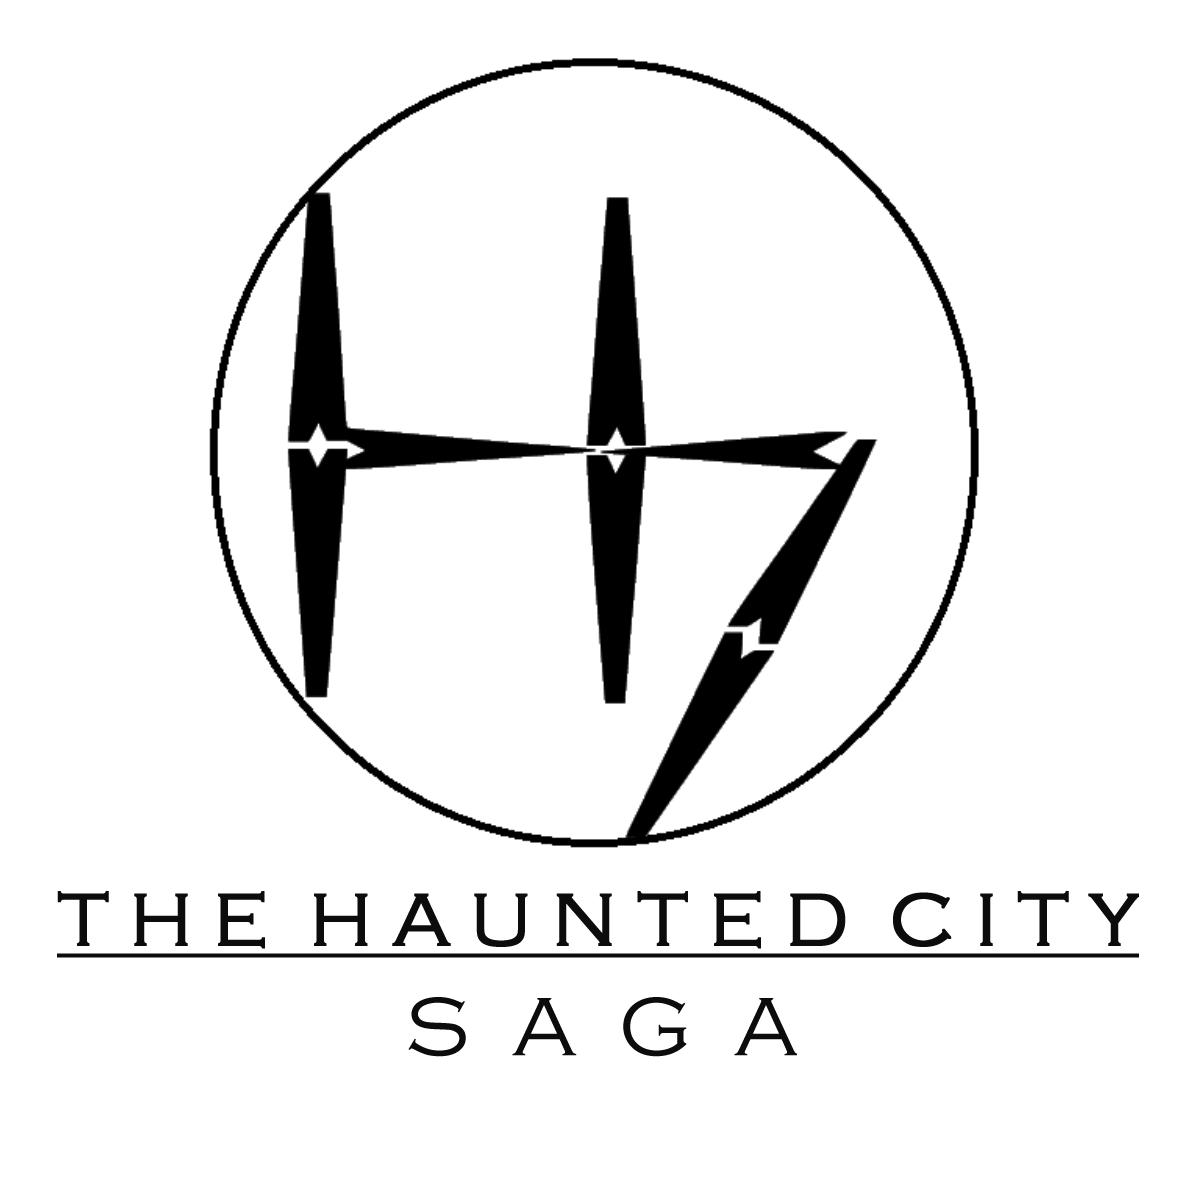 THE HAUNTED CITY SAGA